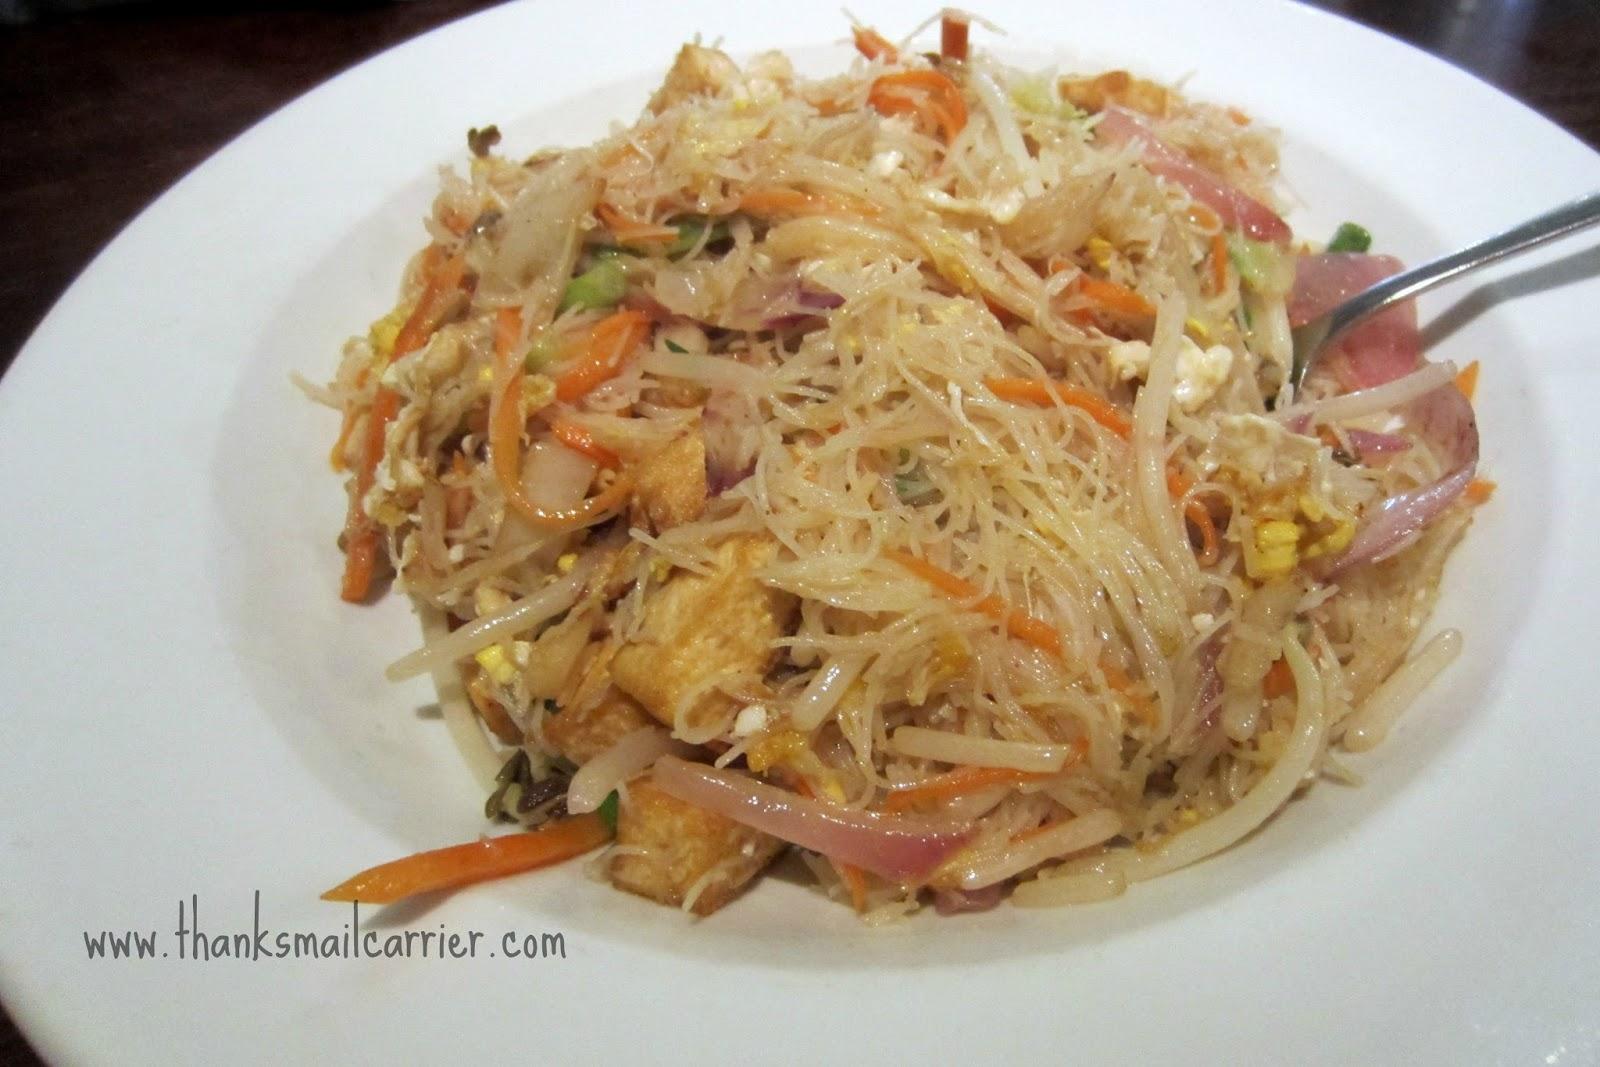 FuGu noodles